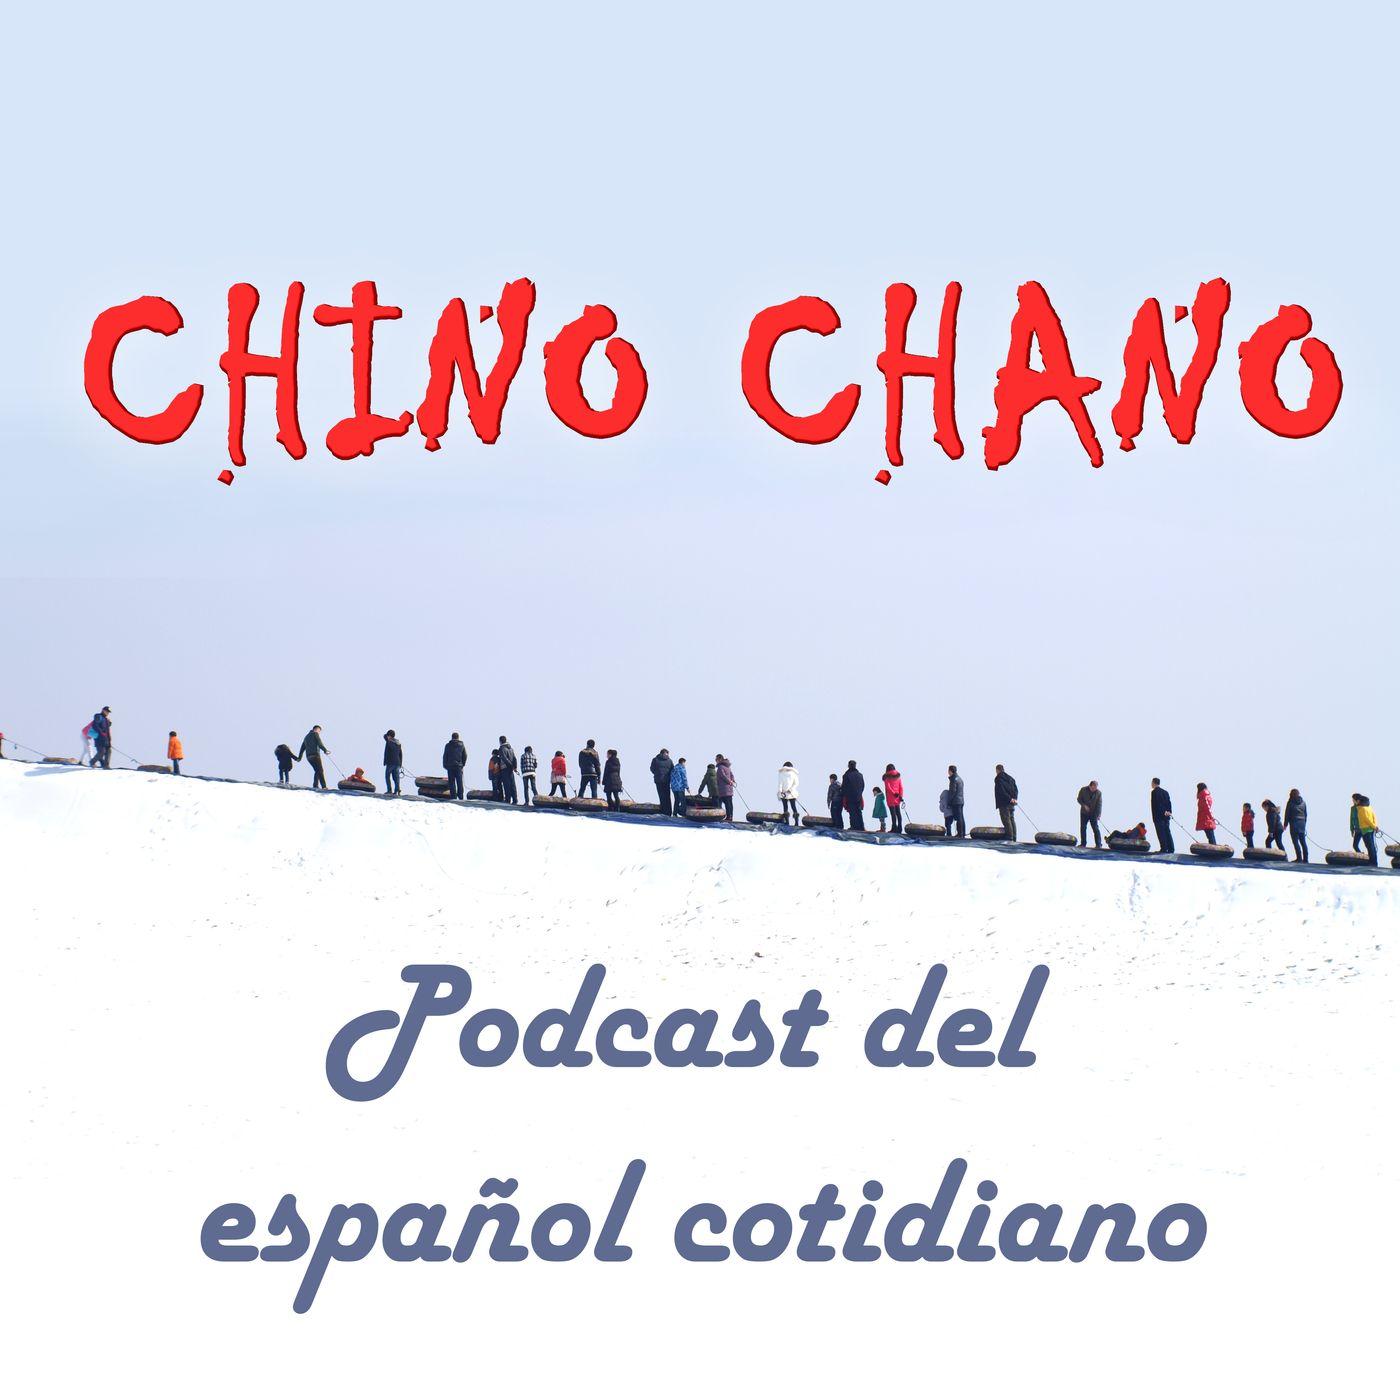 Chino chano: español cotidiano